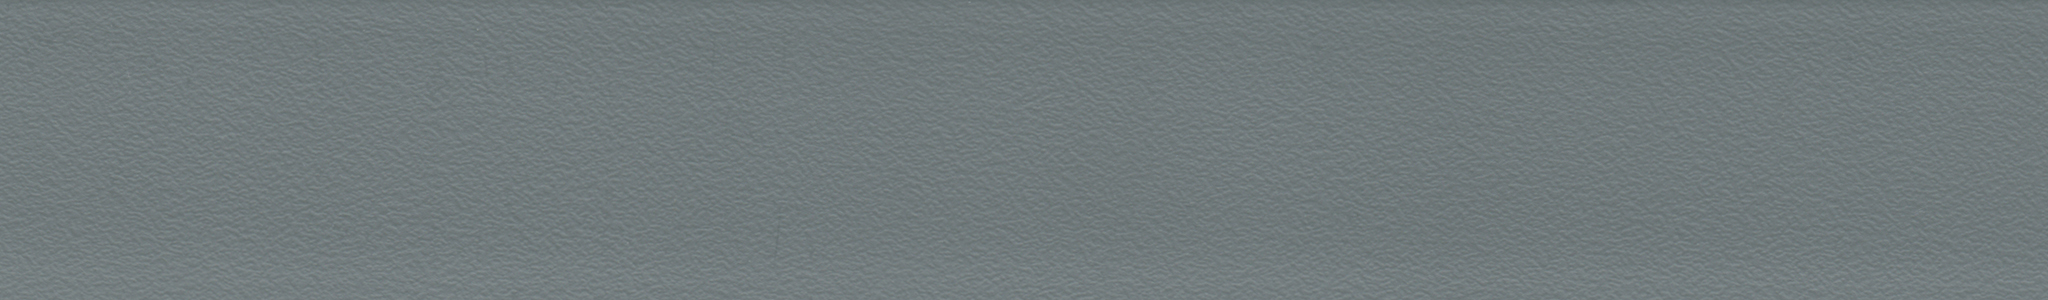 HU 17963 кромка ABS серая жемчуг XG